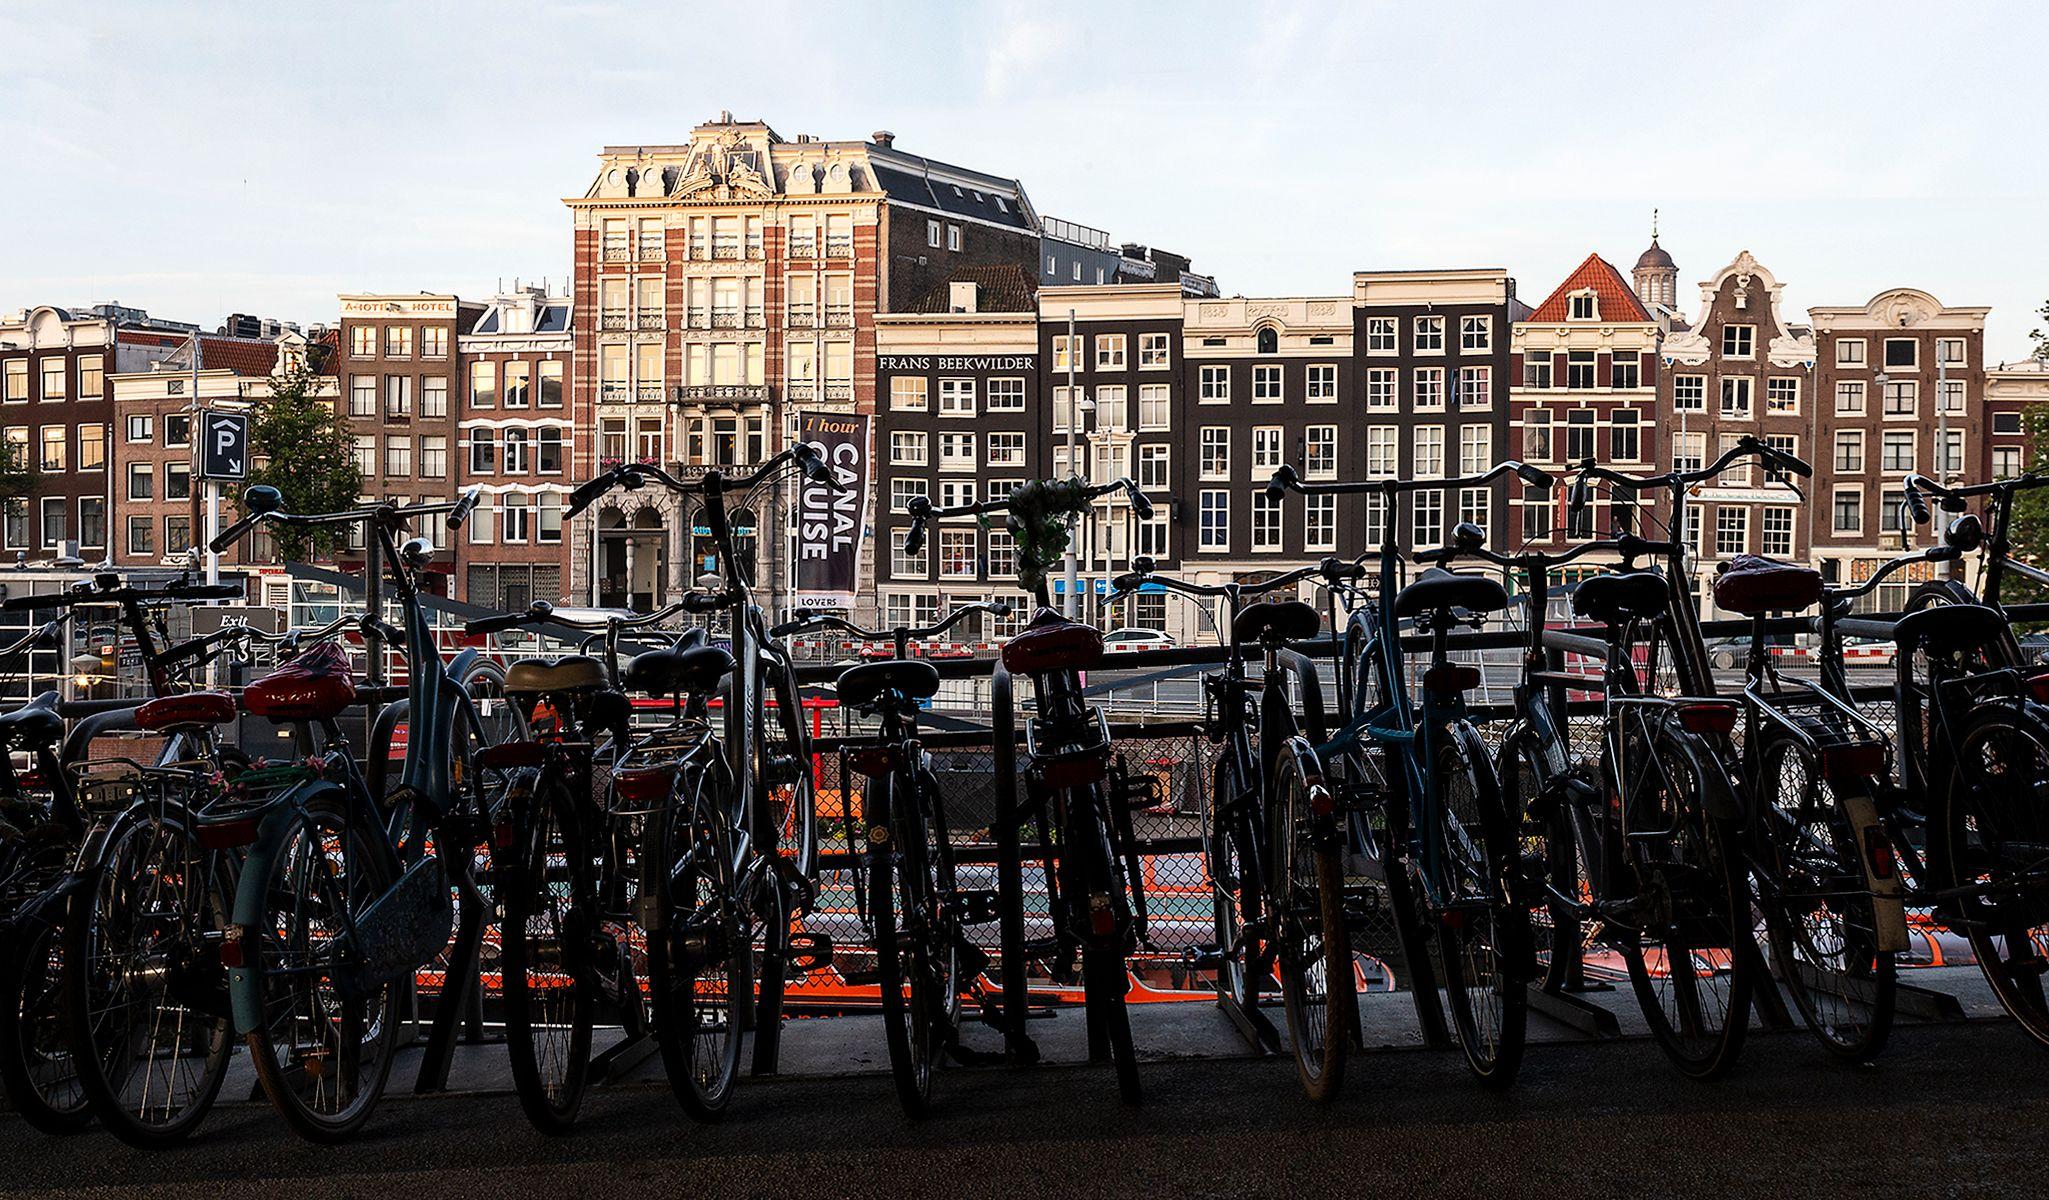 Amsterdam1 copy.jpg